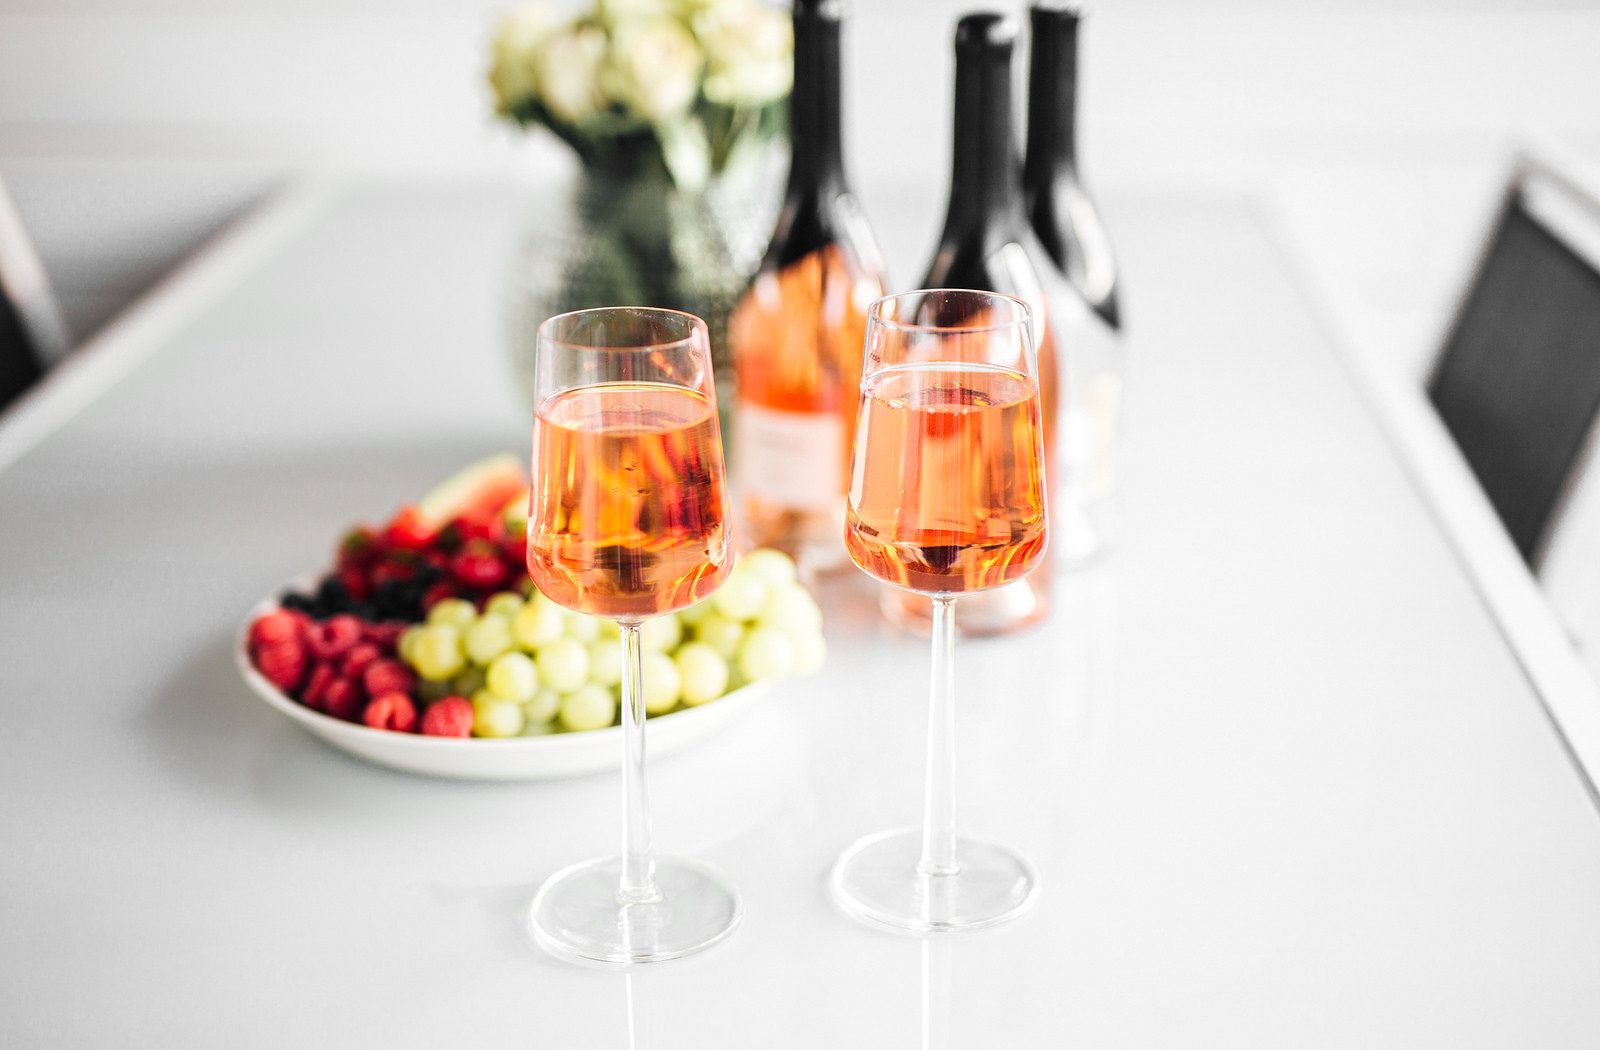 rosee viinit makea